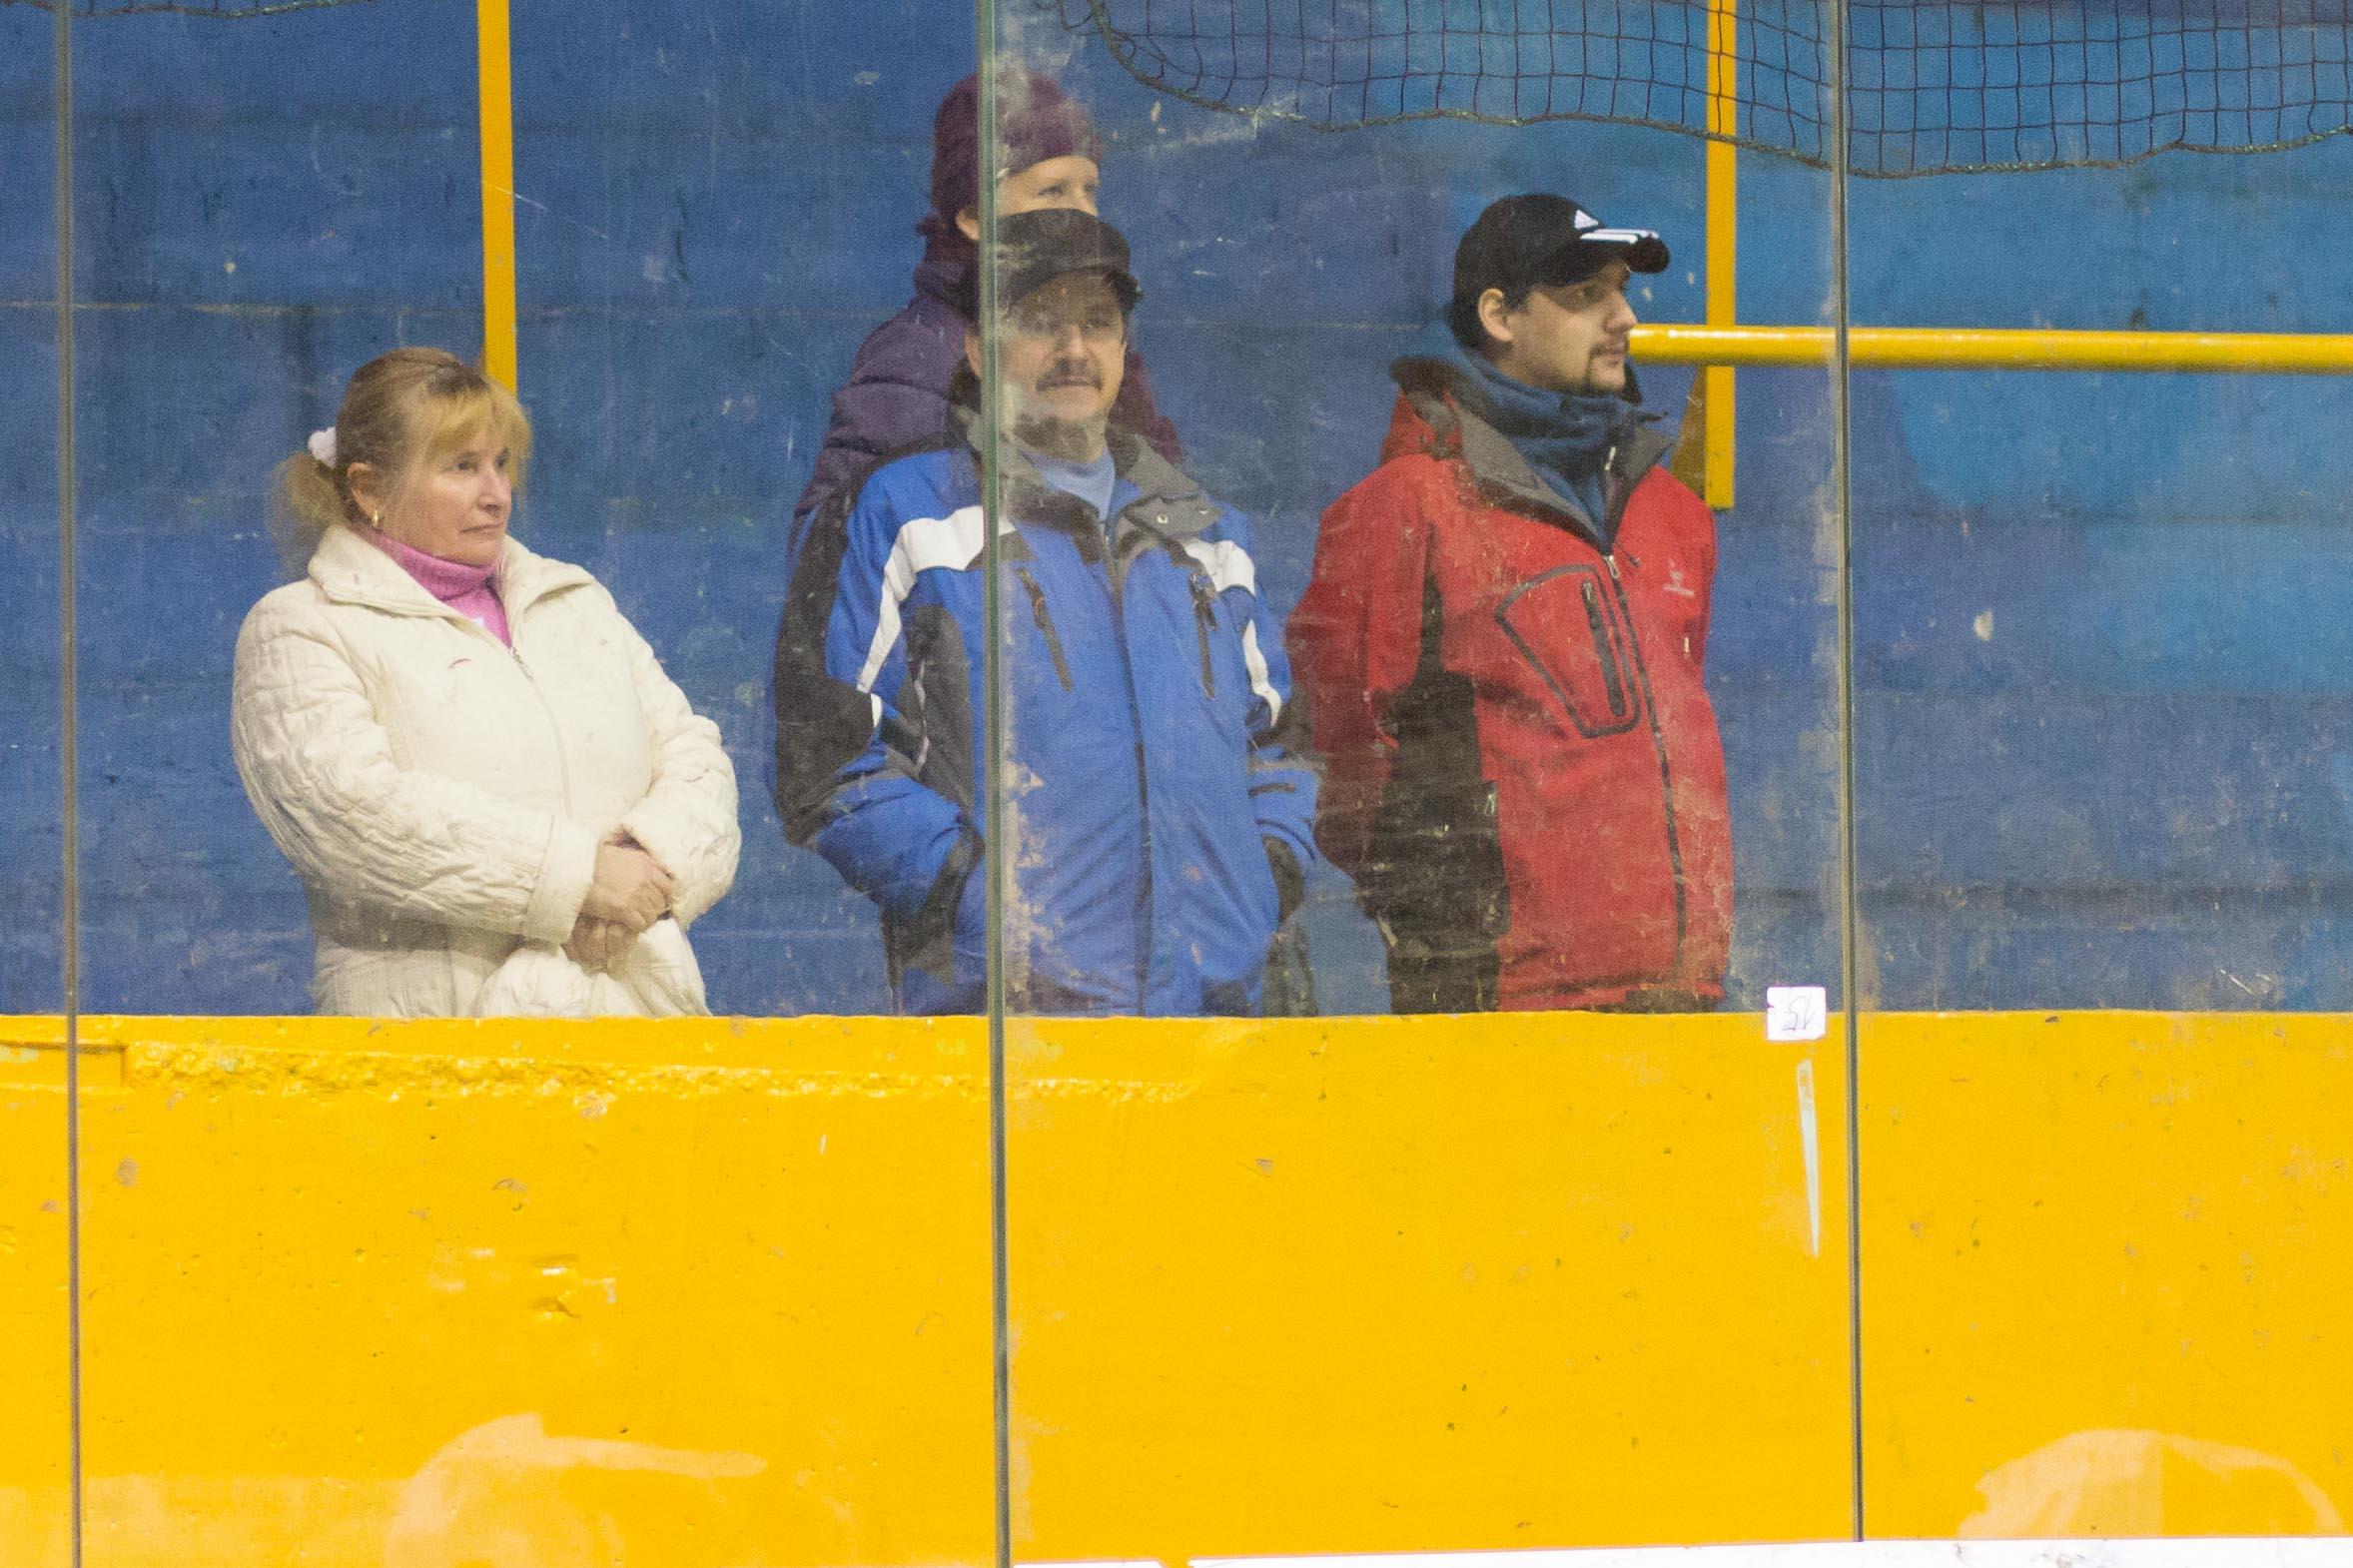 zhkm-zvolen-hc-spisska-n-ves-2013-hokej-27